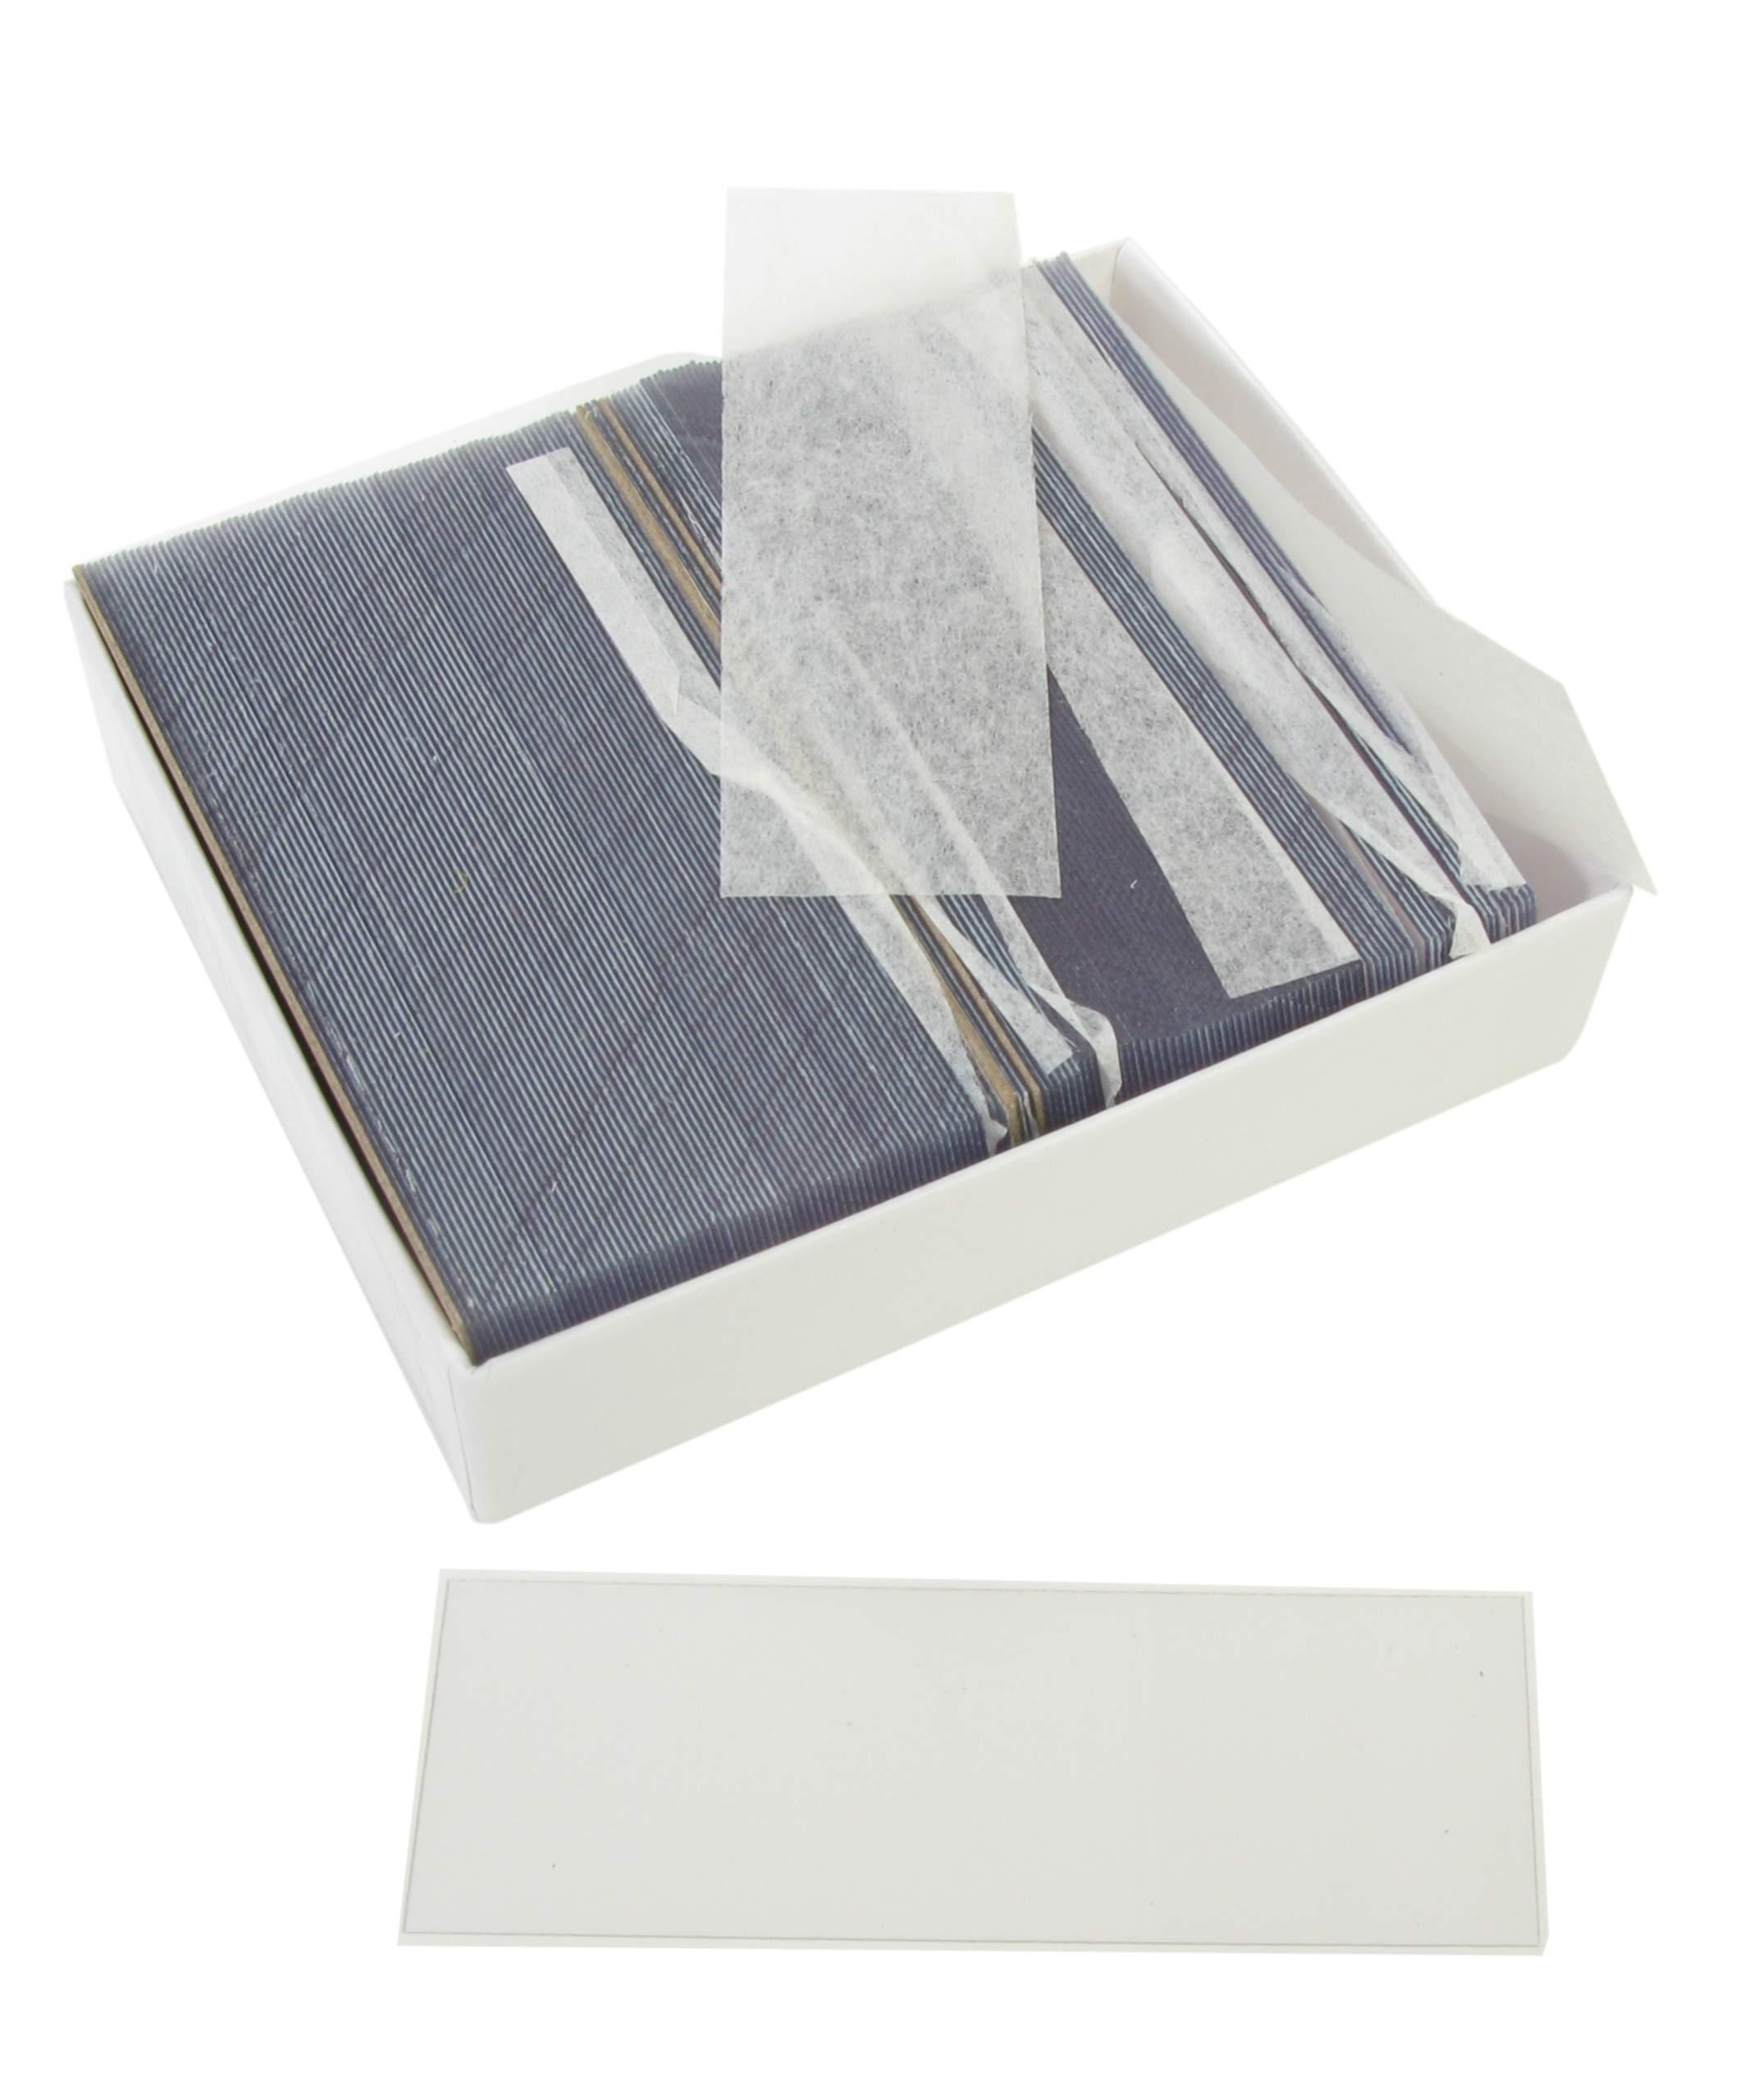 American Educational 7-1305-15 Plastic Microscope Slides, 1 x 3'' Size (144 slides) by American Educational Products